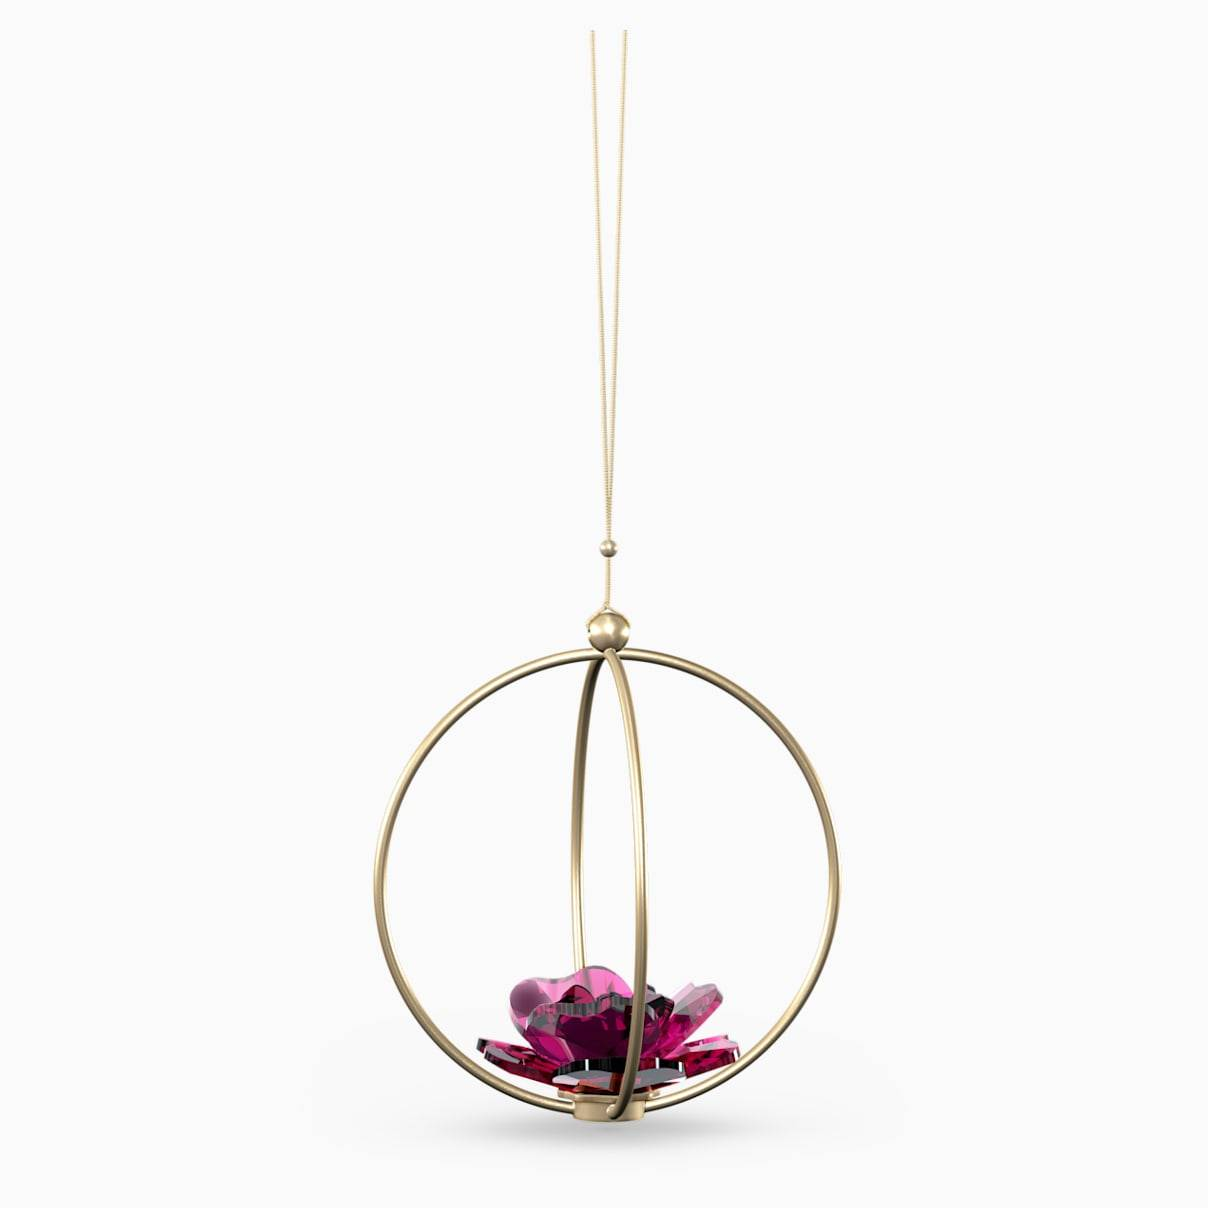 Swarovski Garden Tales Rose Ball Ornament, Large